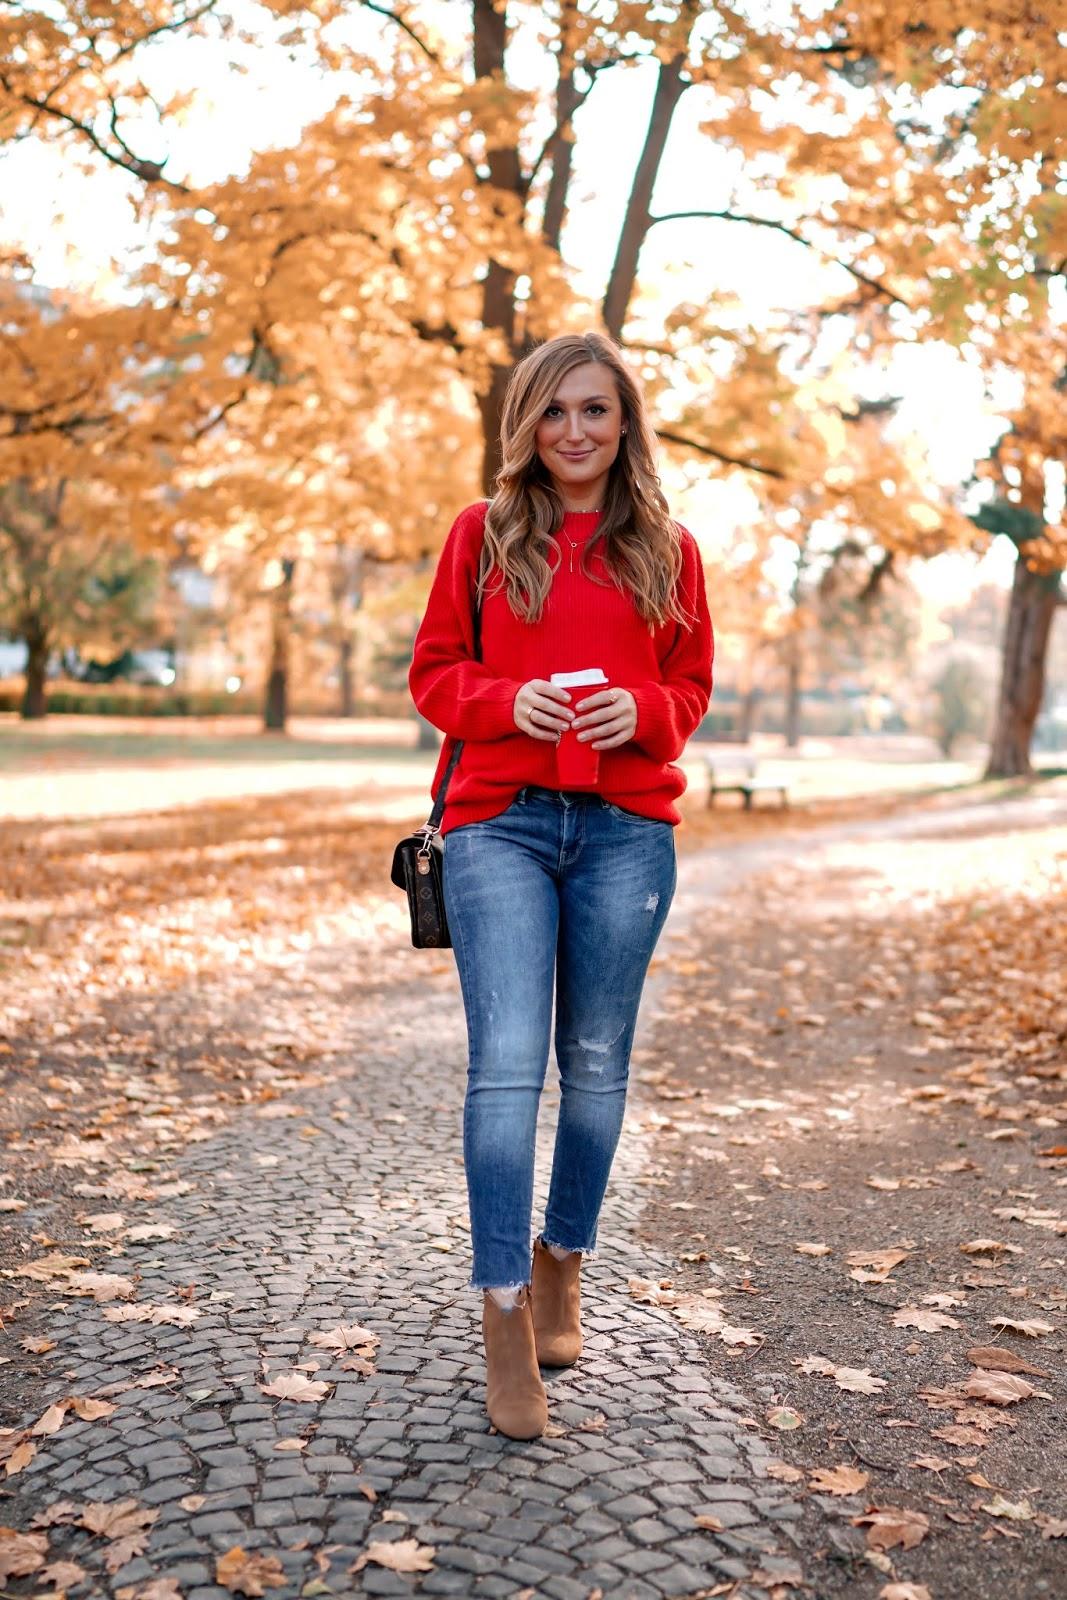 Roter-pullover-conleys-Louis-vuitton-metis-fashionblogger-Herbstoutfit-braune-lederjacke-braune-lederbooties-braune-Boots-stiefeletten-in-braun